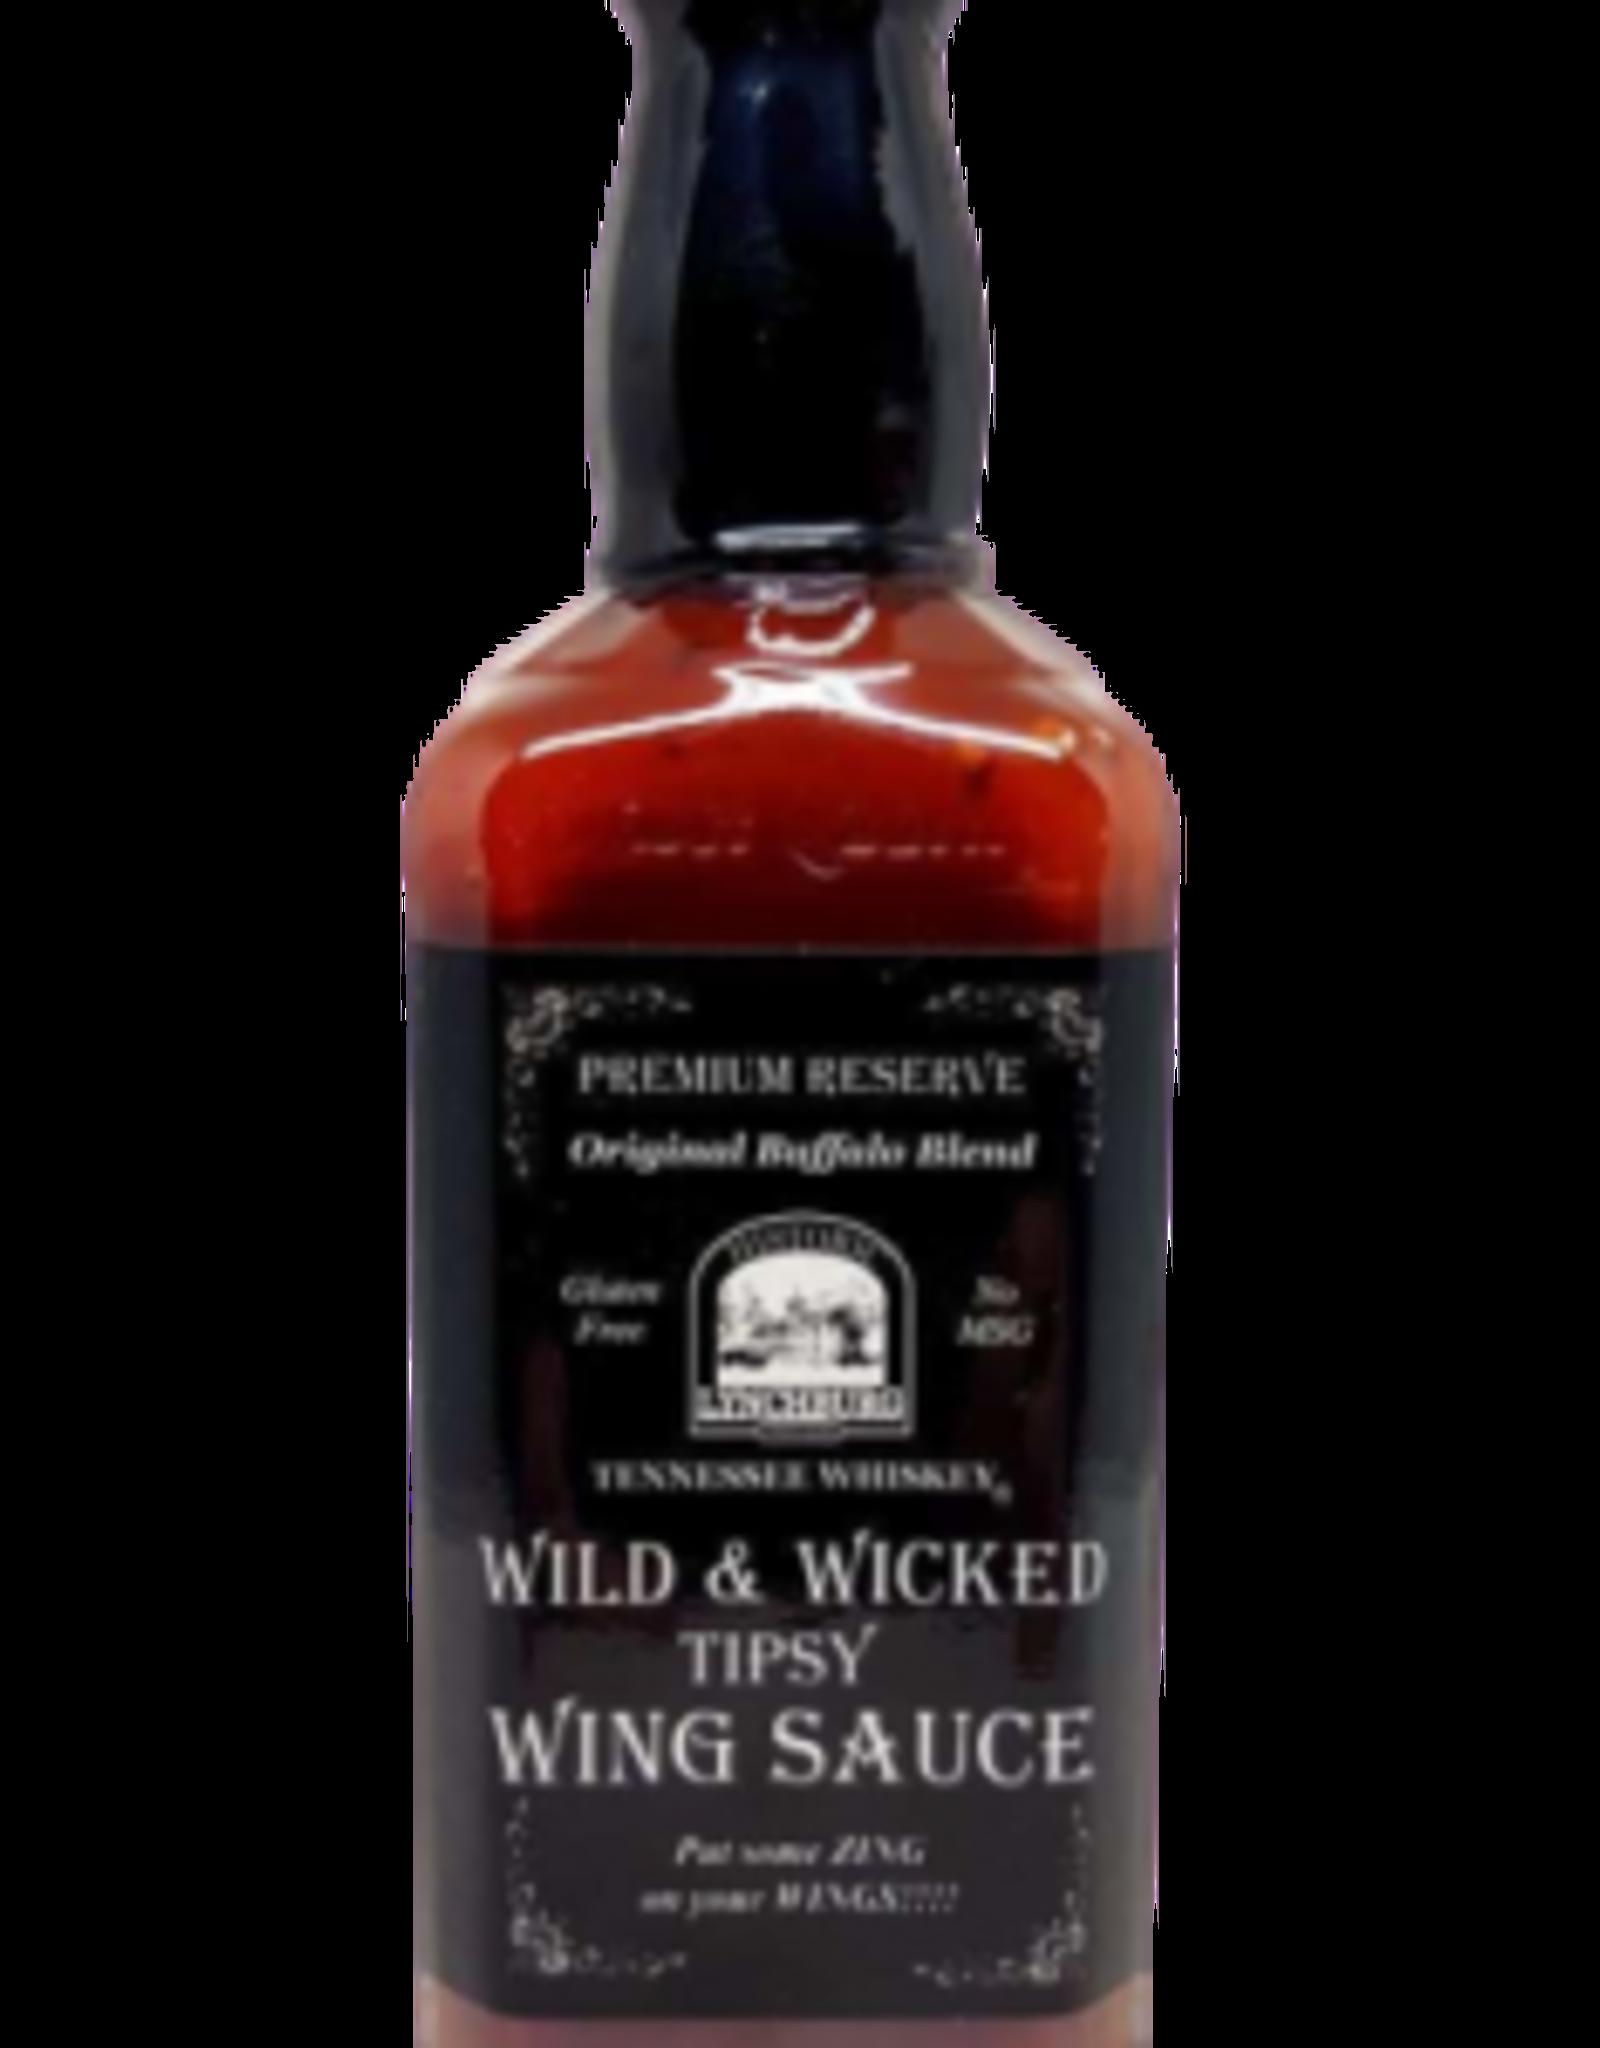 Historic Lynchburg Wild & Wicked Wing Sauce